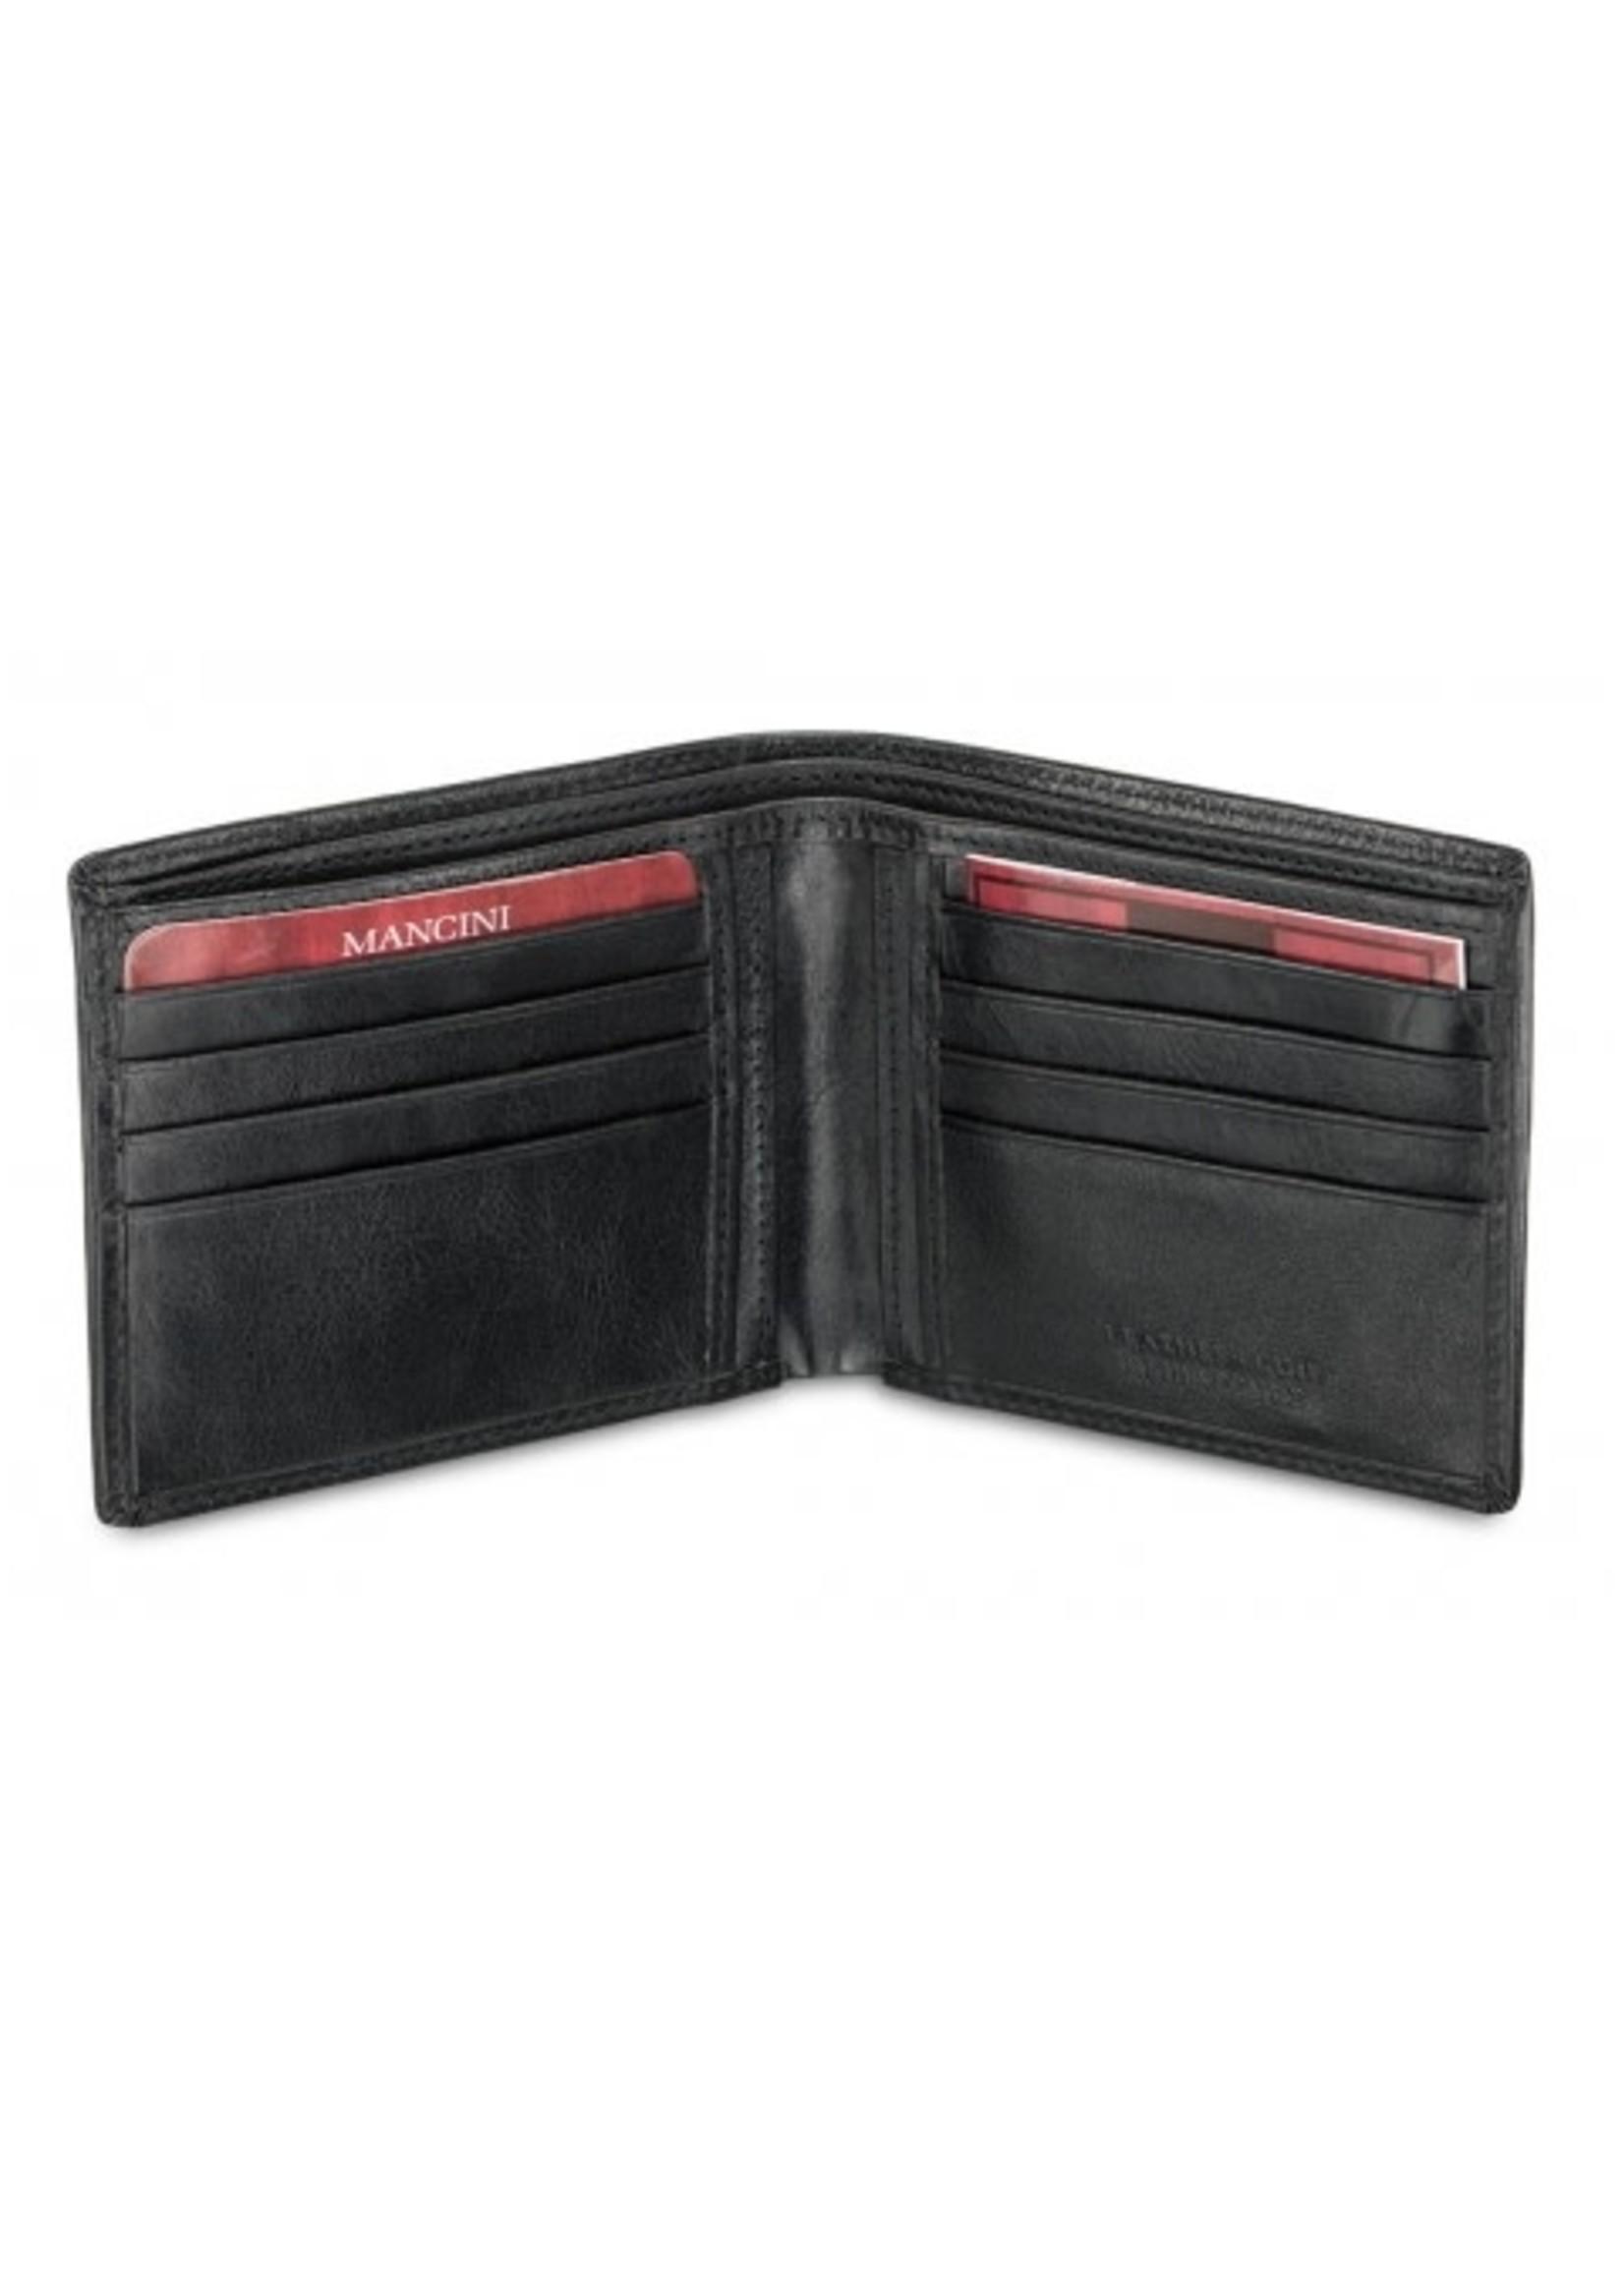 Mancini Men's RFID Secure Classic Leather Billfold